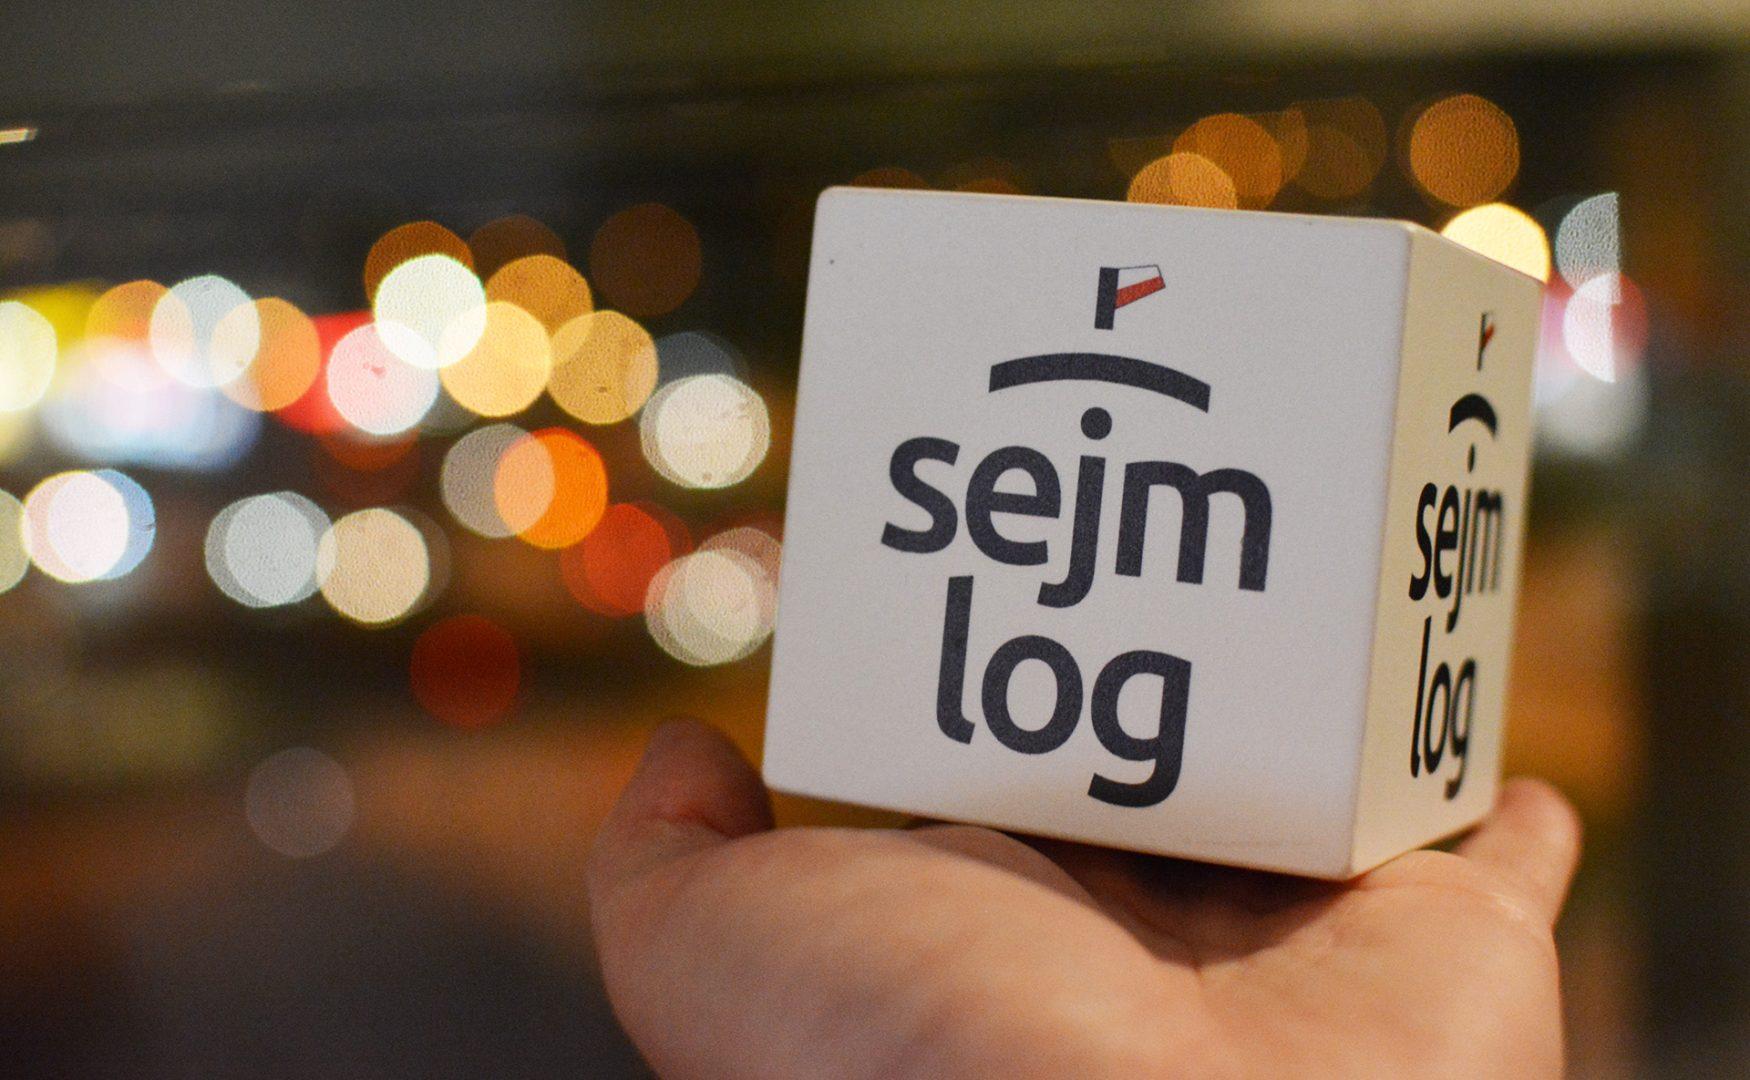 Fundacja SejmLog/Fot. SejmLog